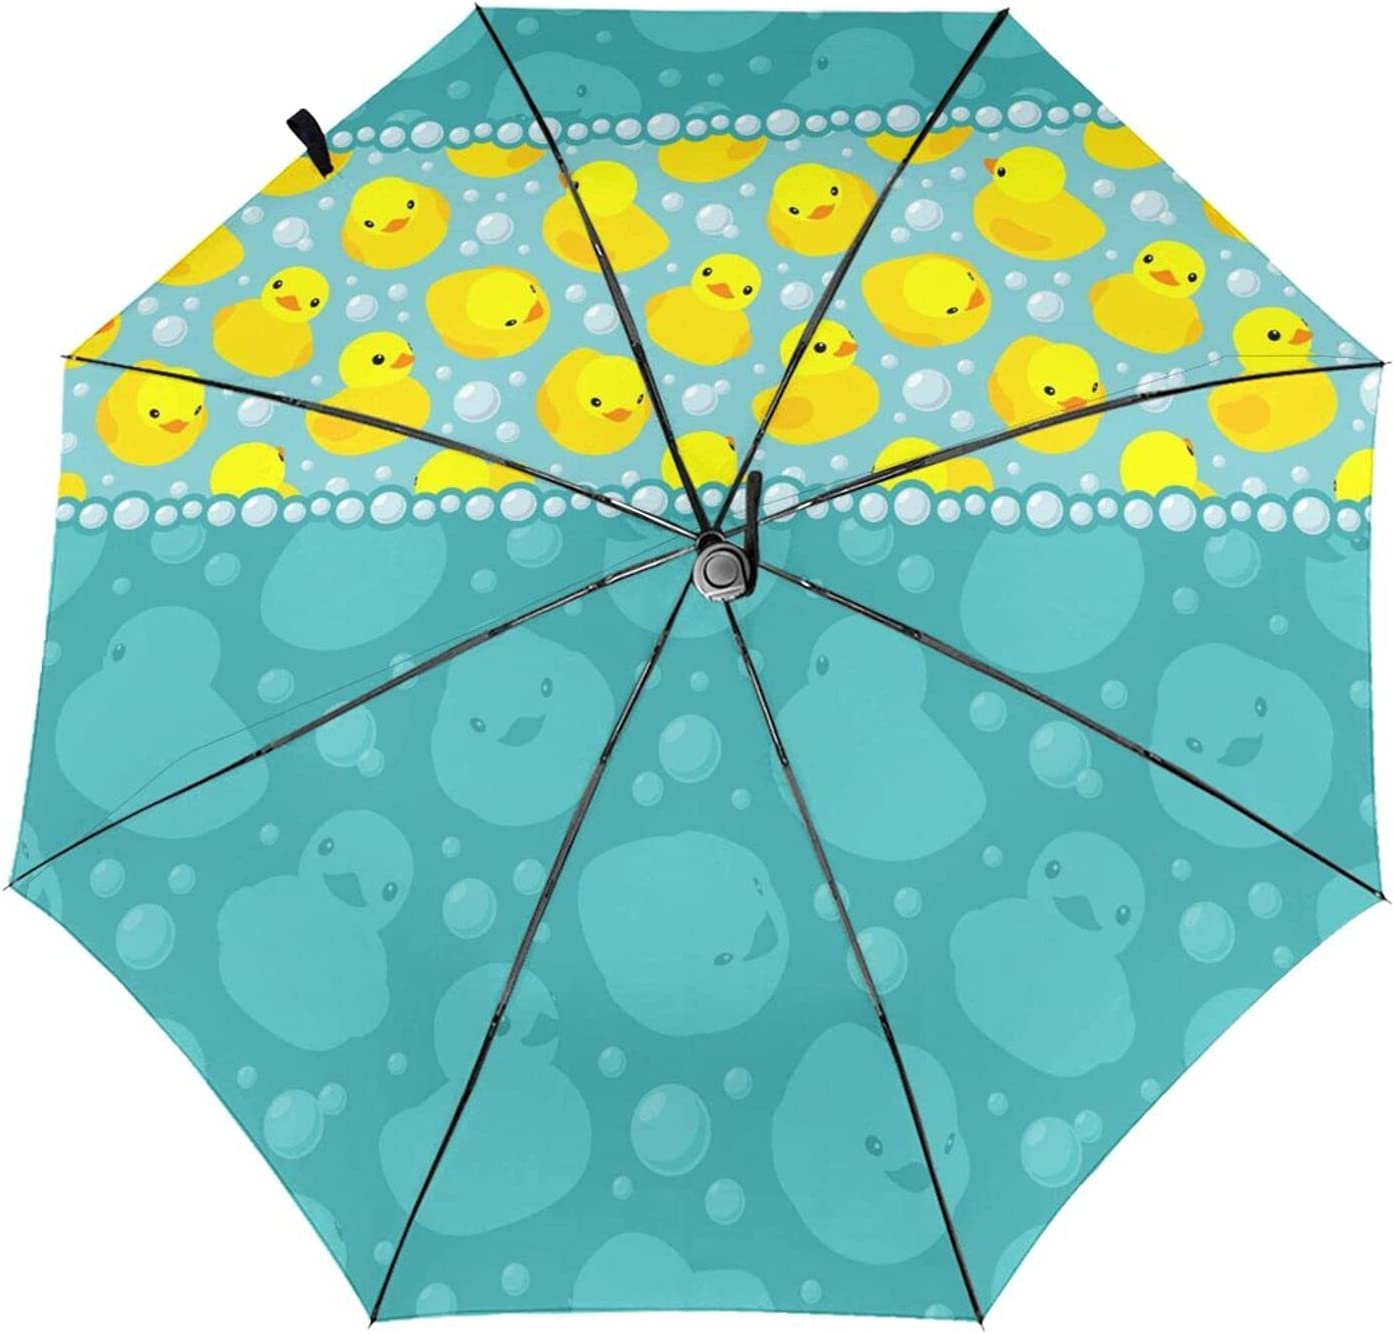 NEWKOW Sun Umbrella Rubber National uniform free shipping Duck Duckies in Elegant Yellow Swimming Water